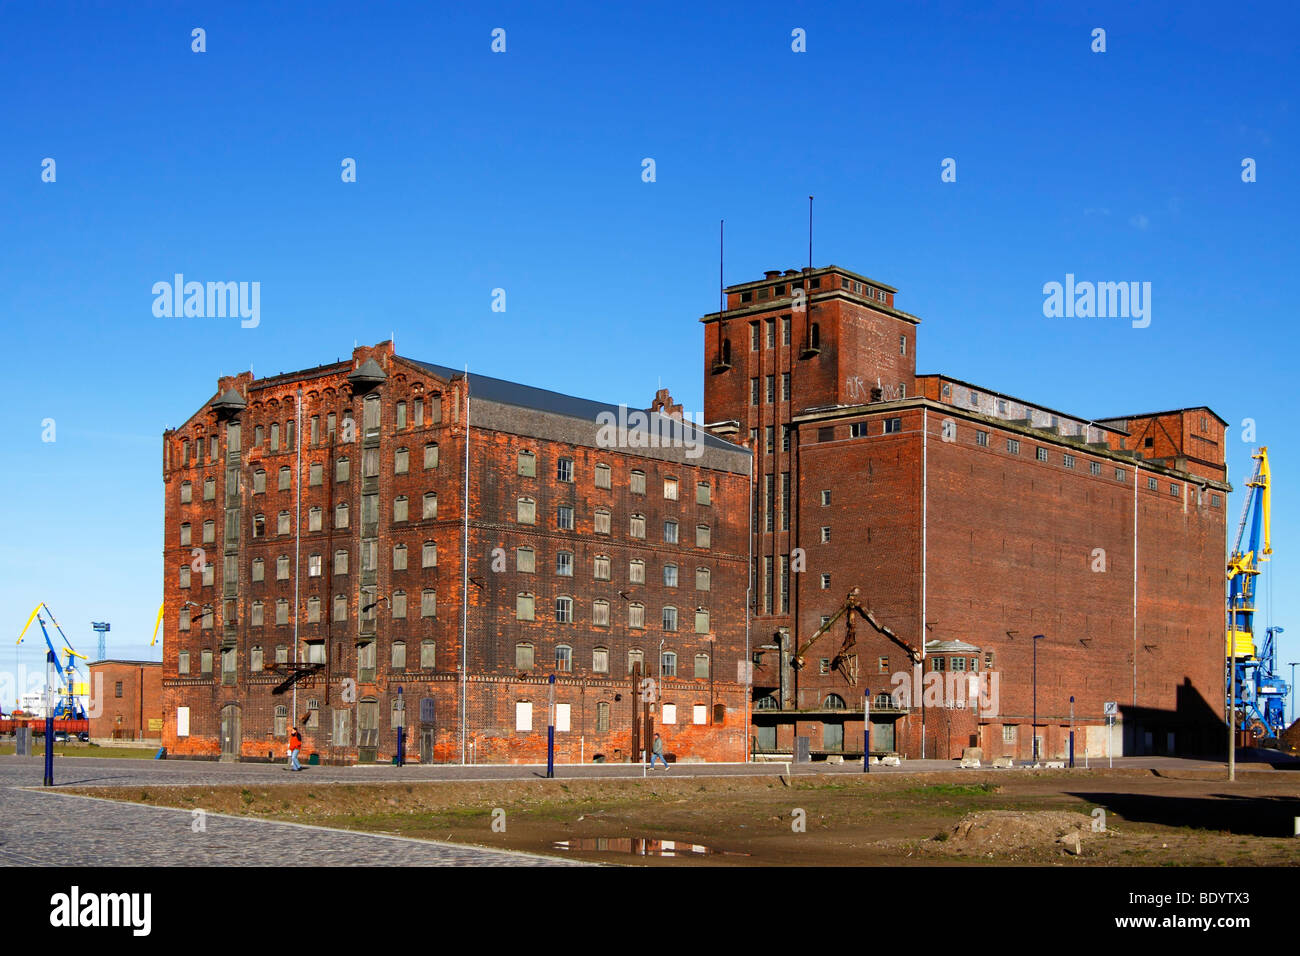 Old reservoir houses / Wismar - Stock Image